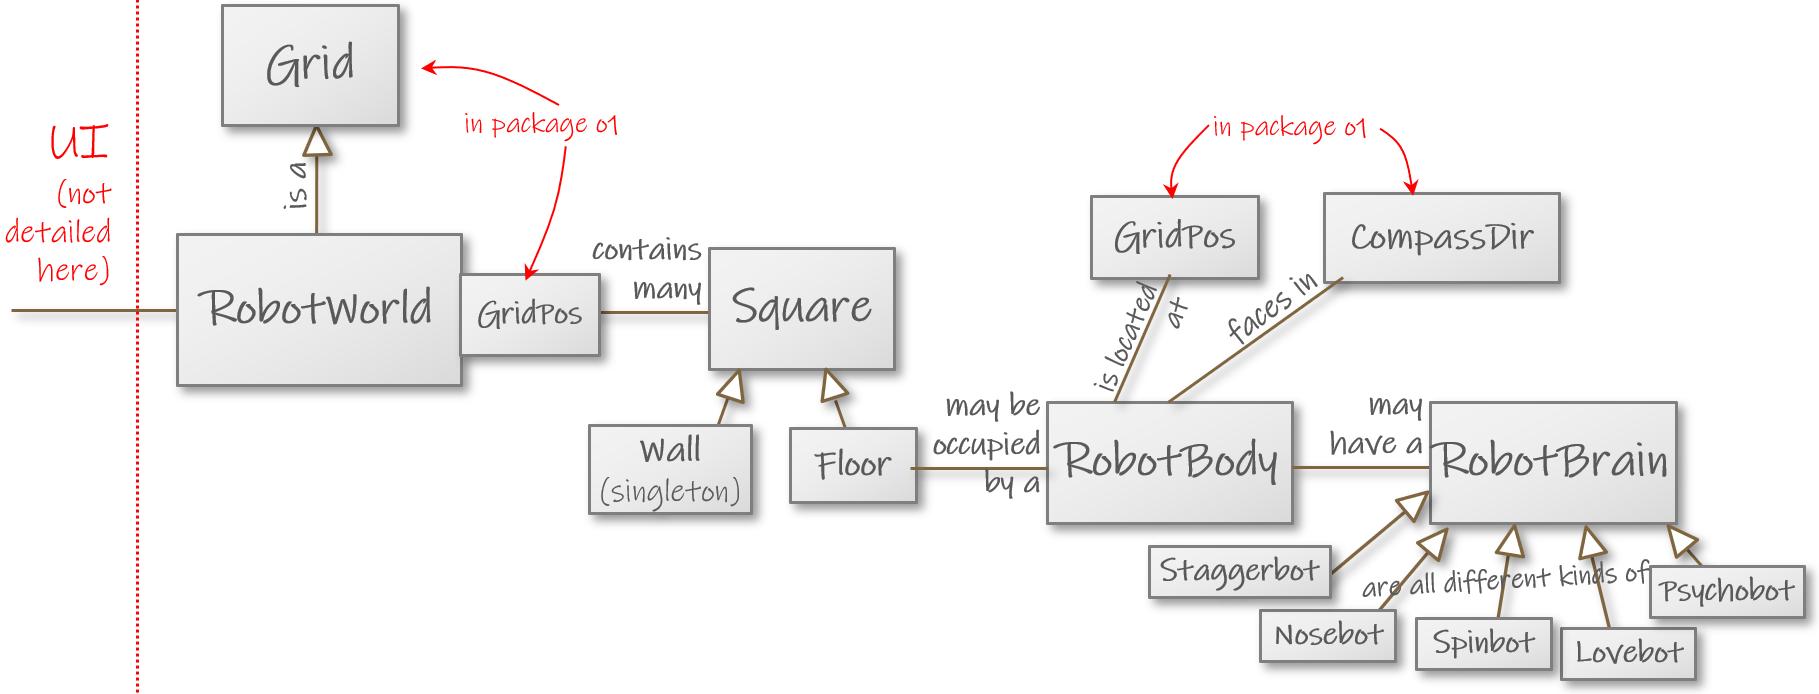 ../_images/project_robots.png